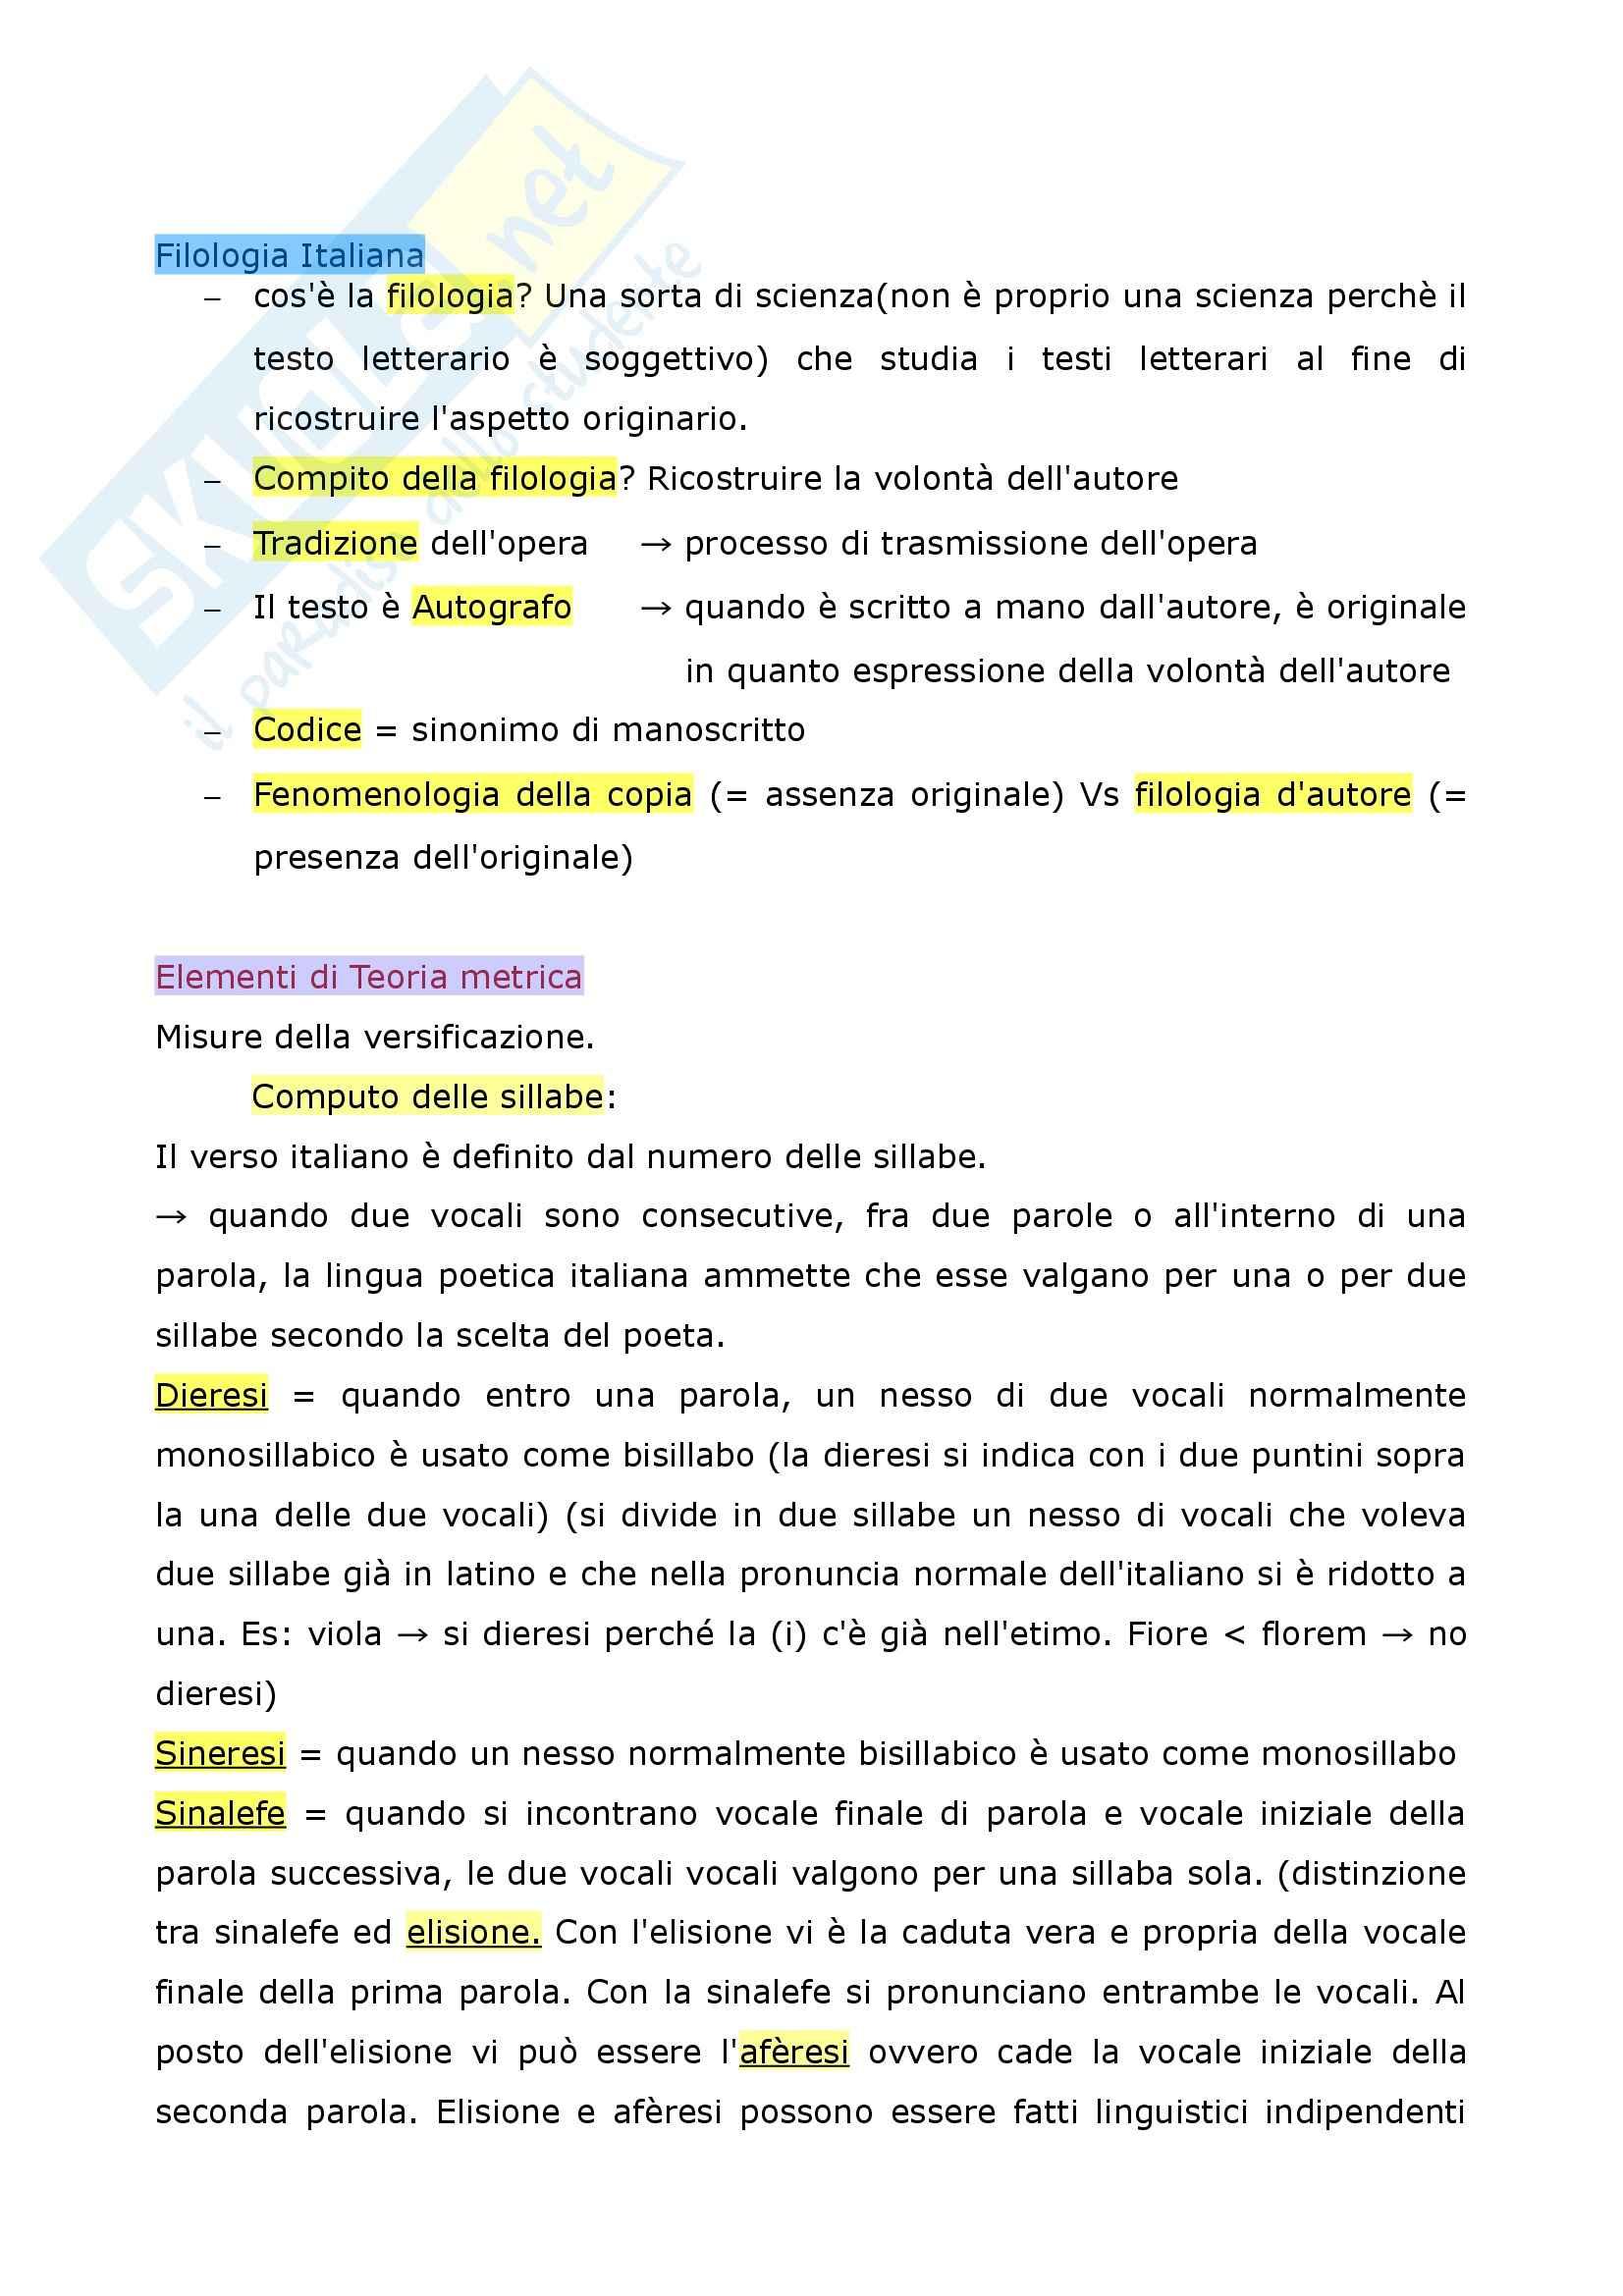 Riassunto esame Filologia italiana, La Metrica italiana, Beltrami, prof. Pancheri